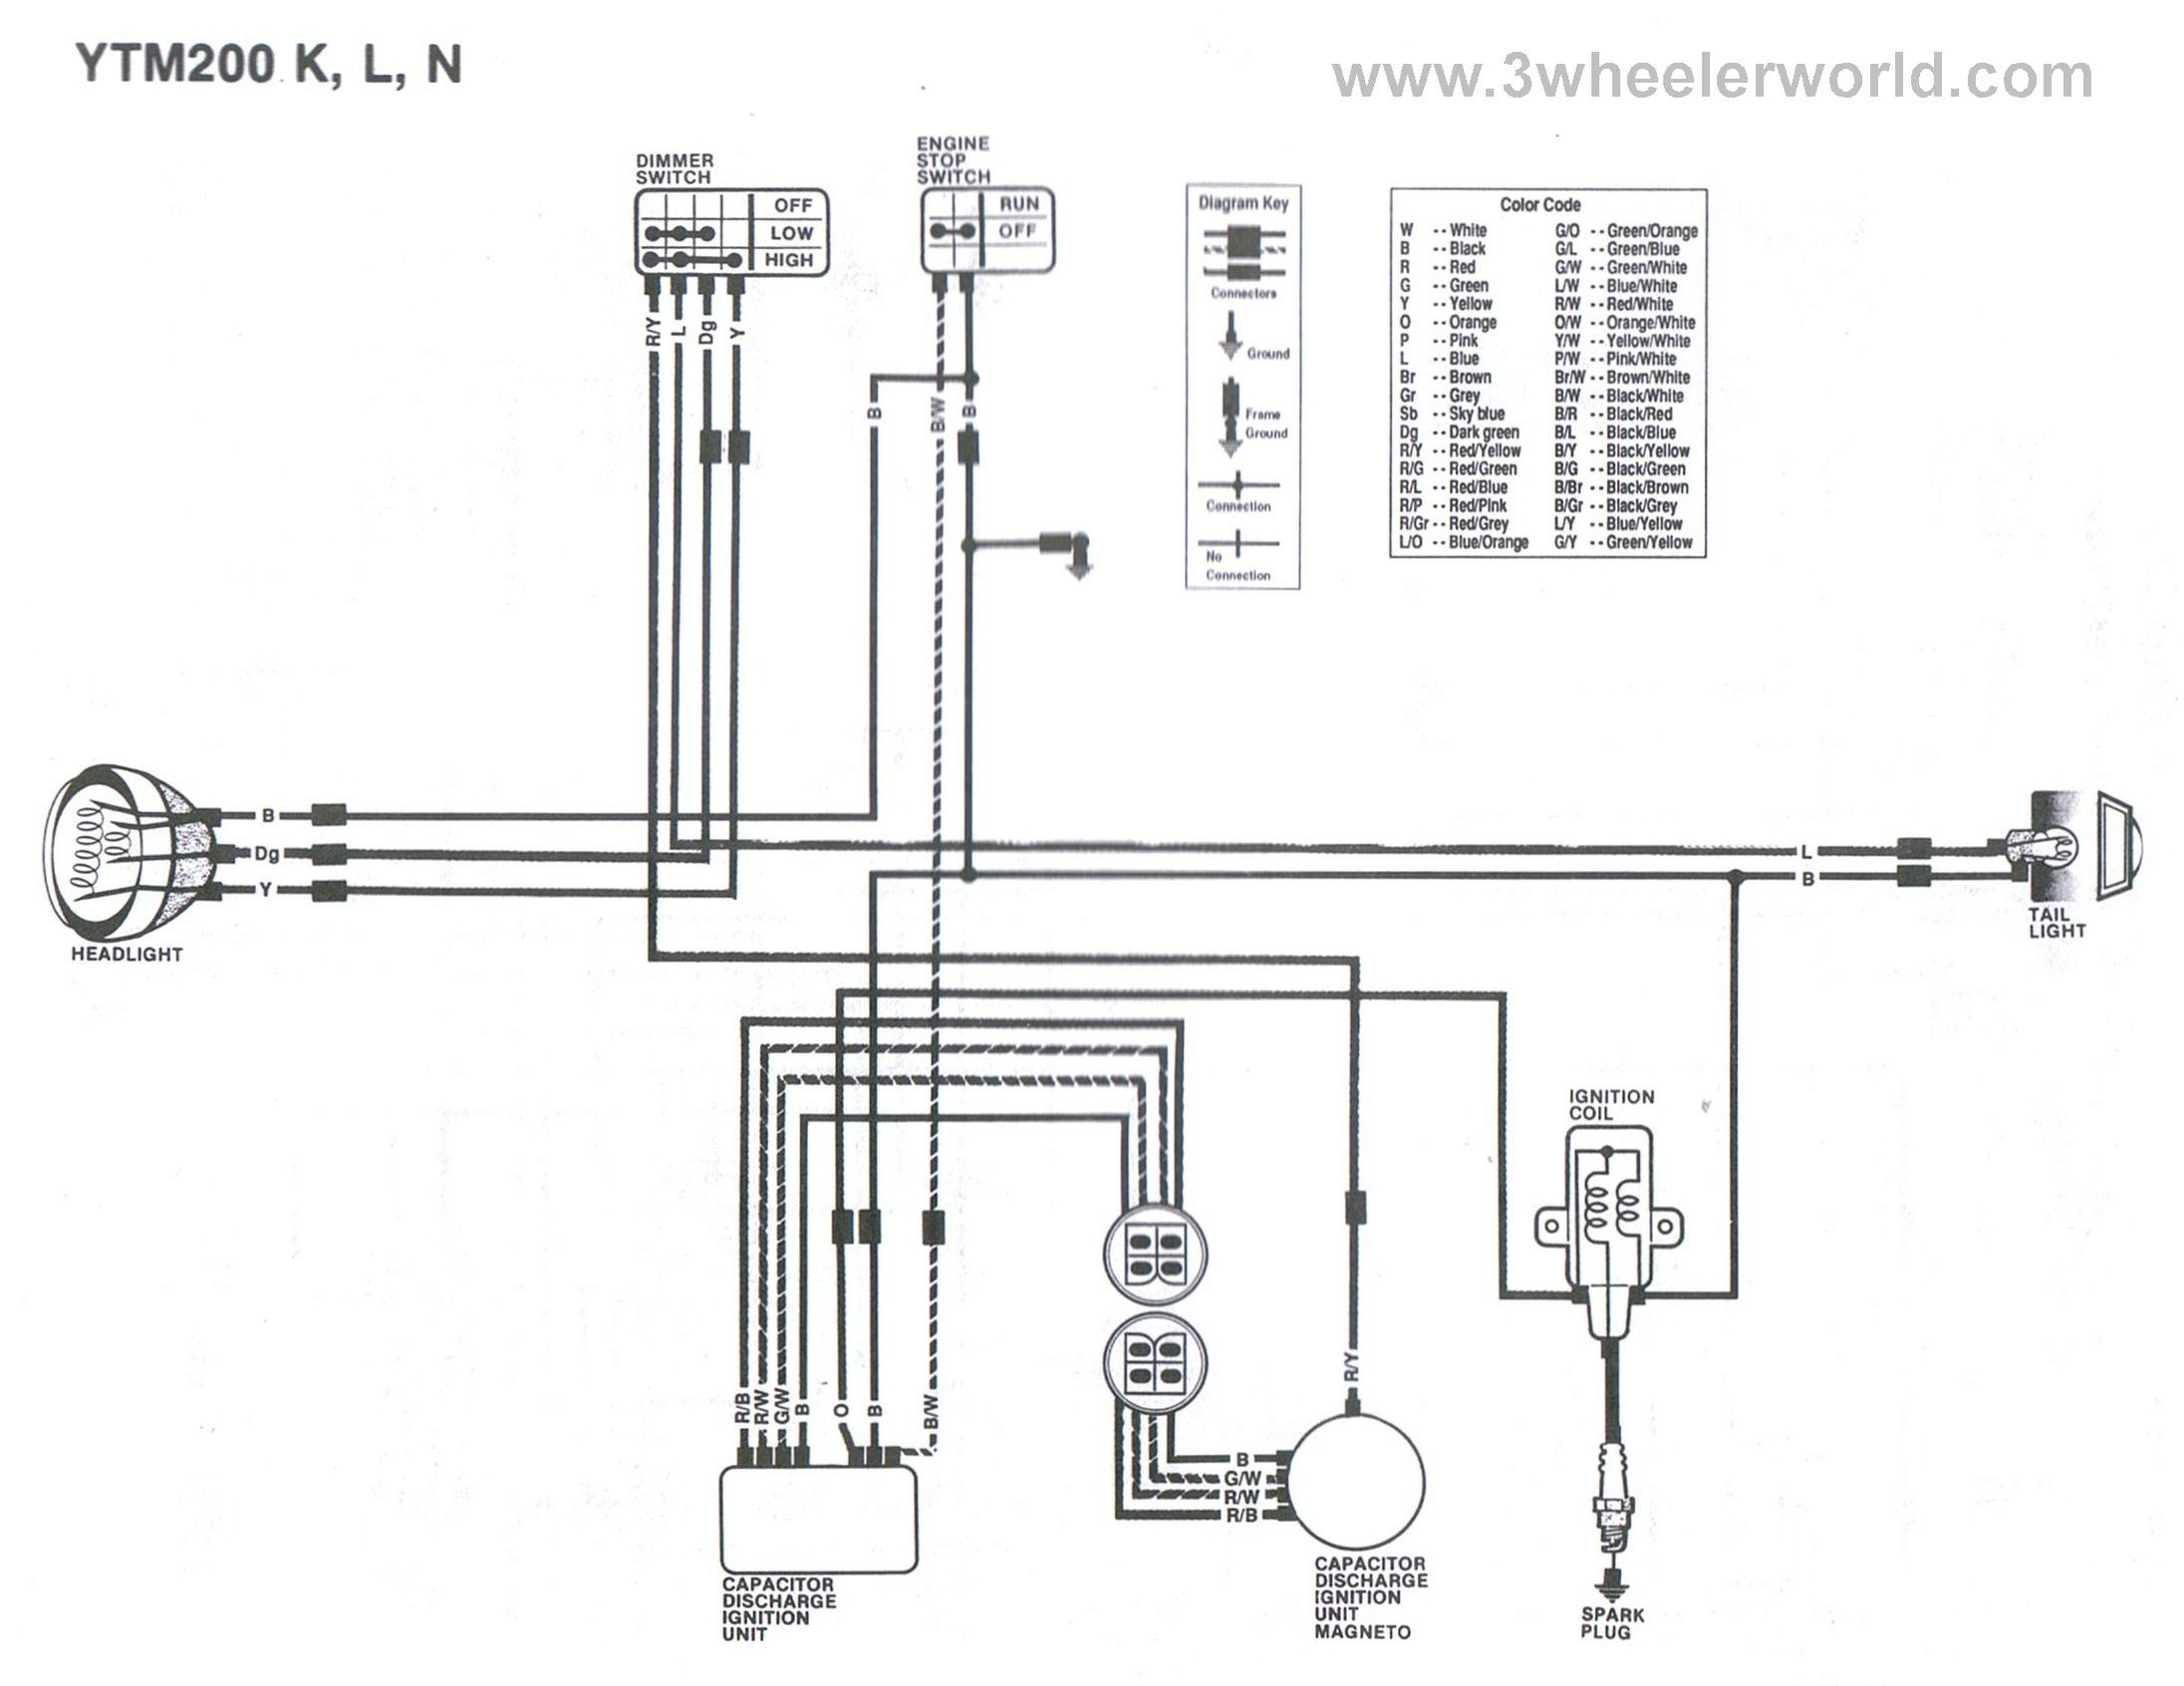 1986 toyota pickup wiring diagram annavernon 1985 toyota pickup wiring diagram automotive